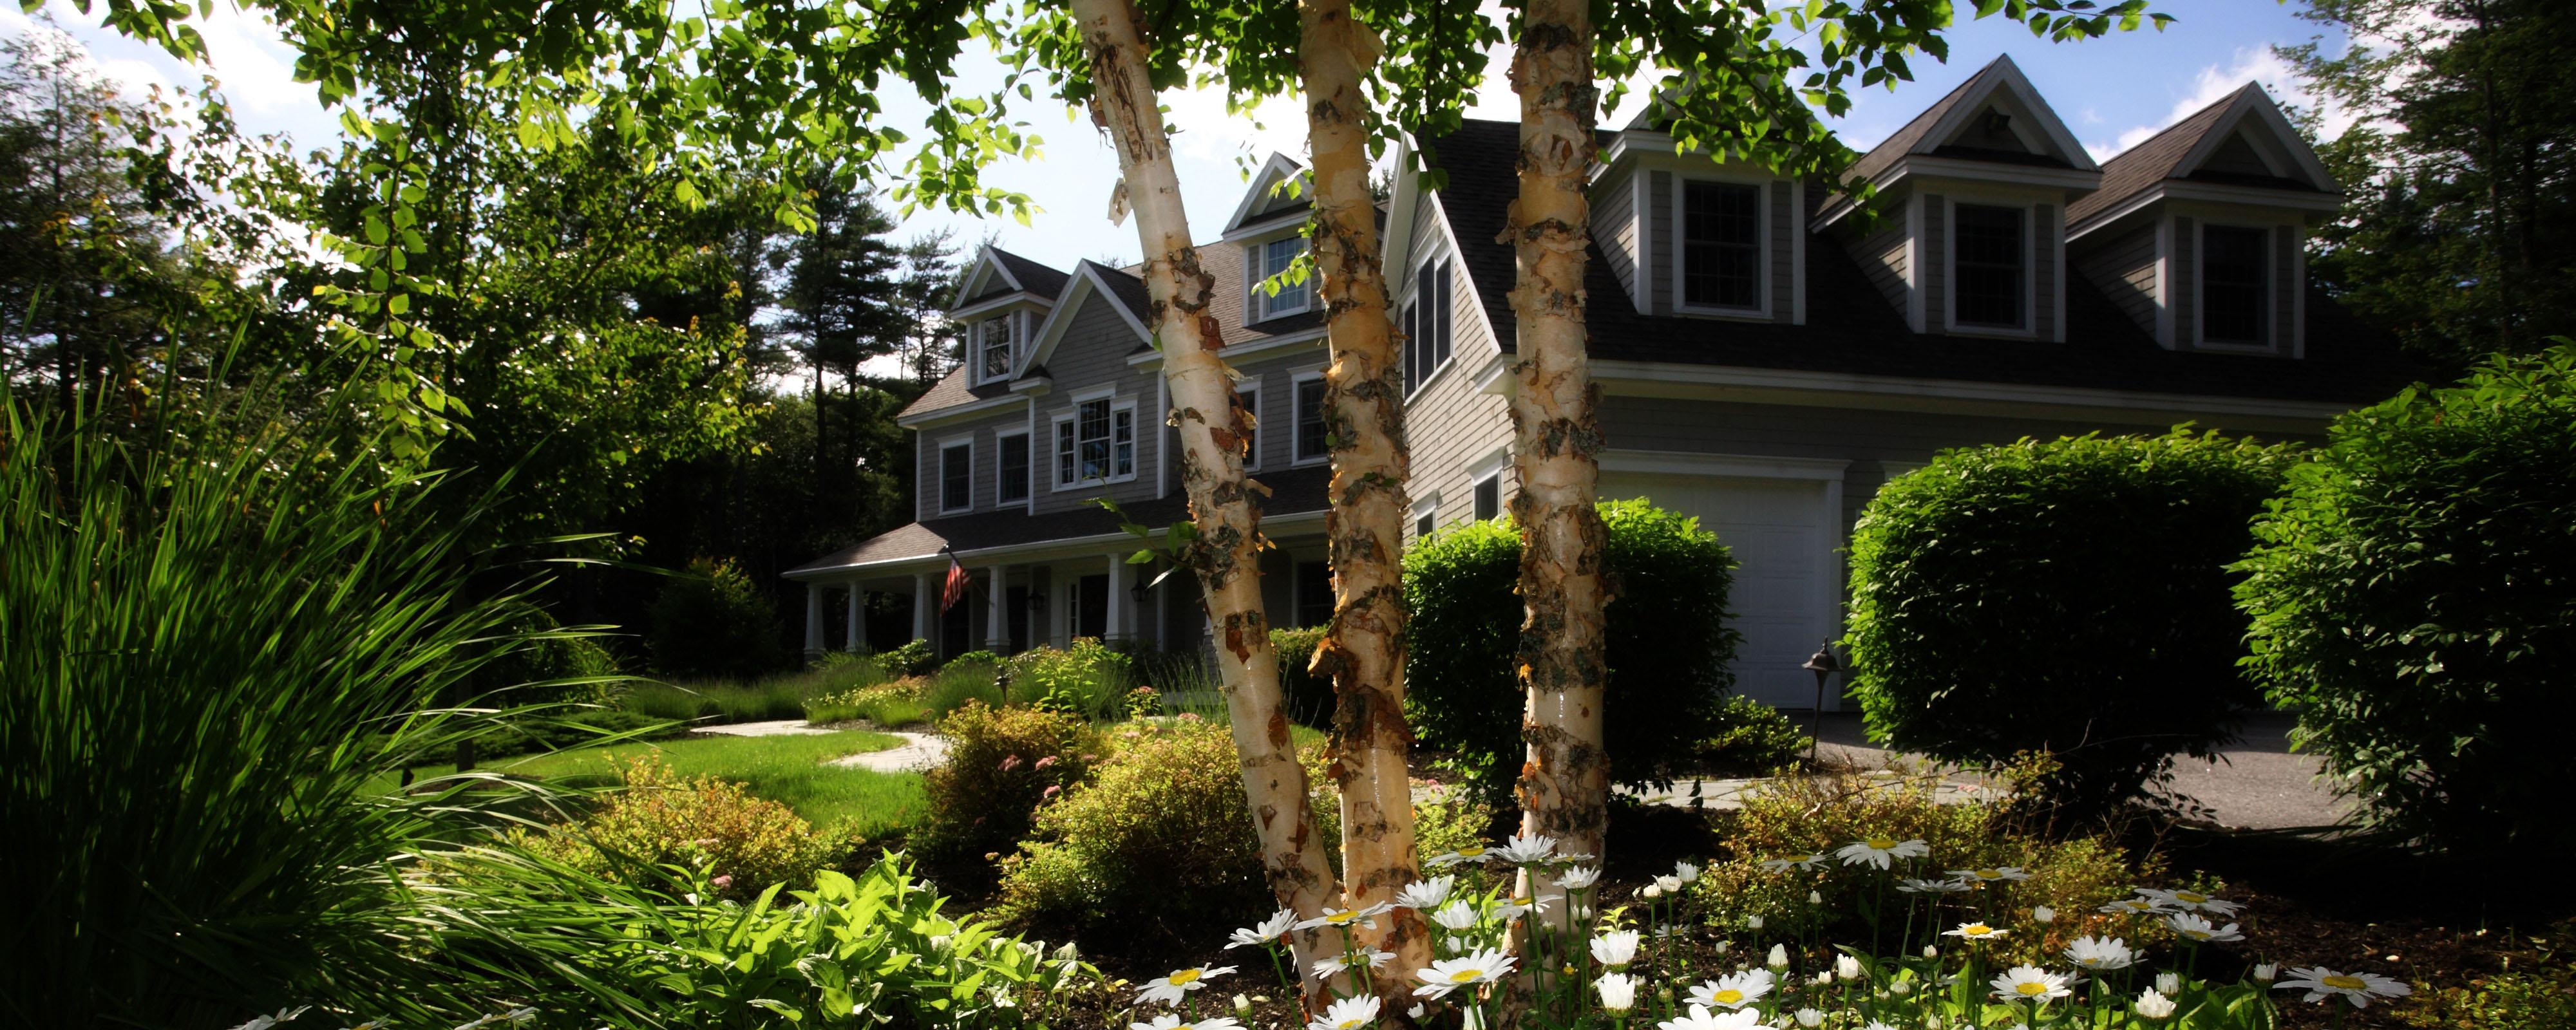 new-homeowner-backyard-inspiration-8.jpg